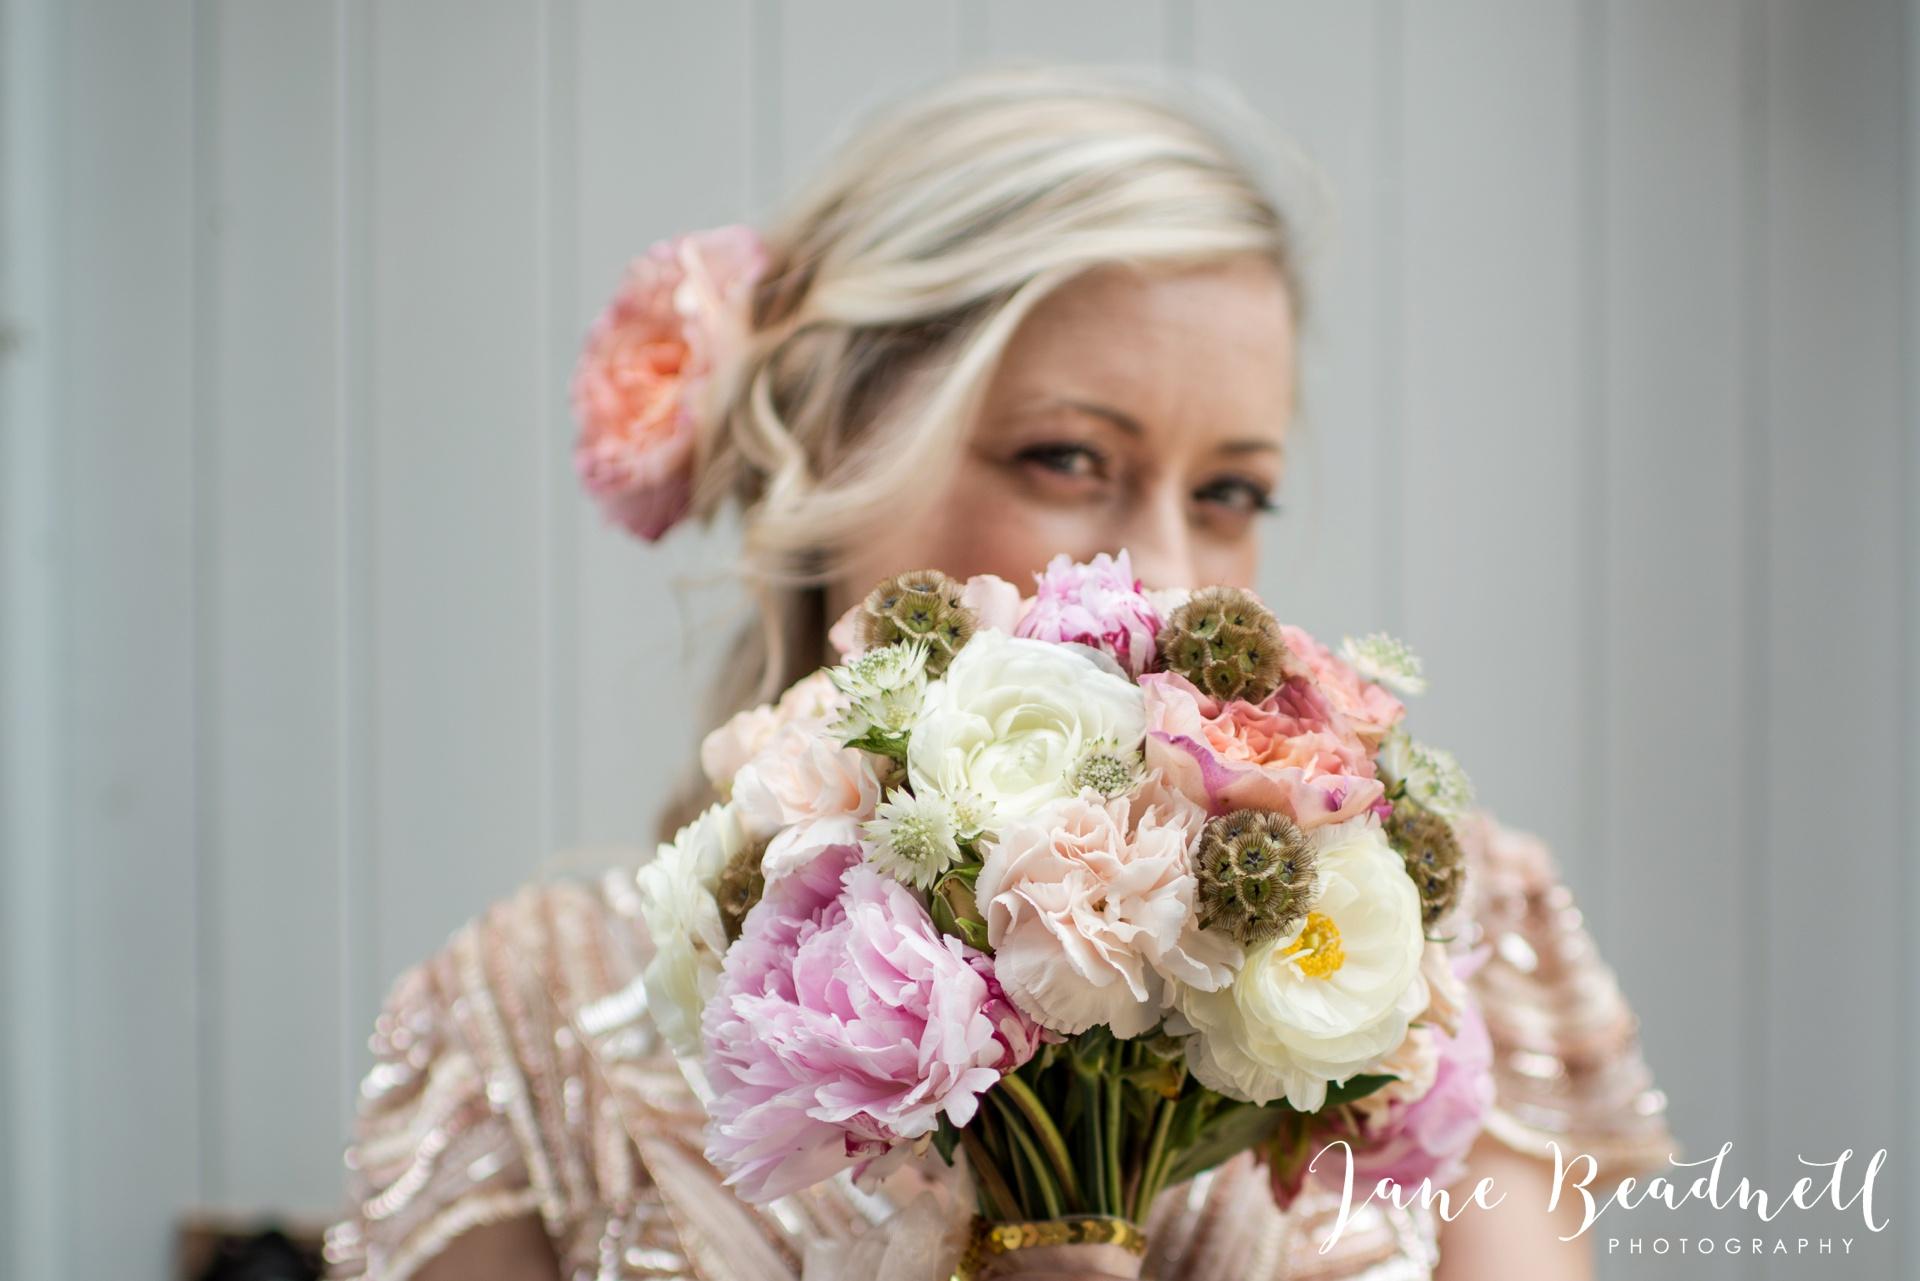 Jane Beadnell fine art wedding photographer York Bridal Photo Shoot_0004